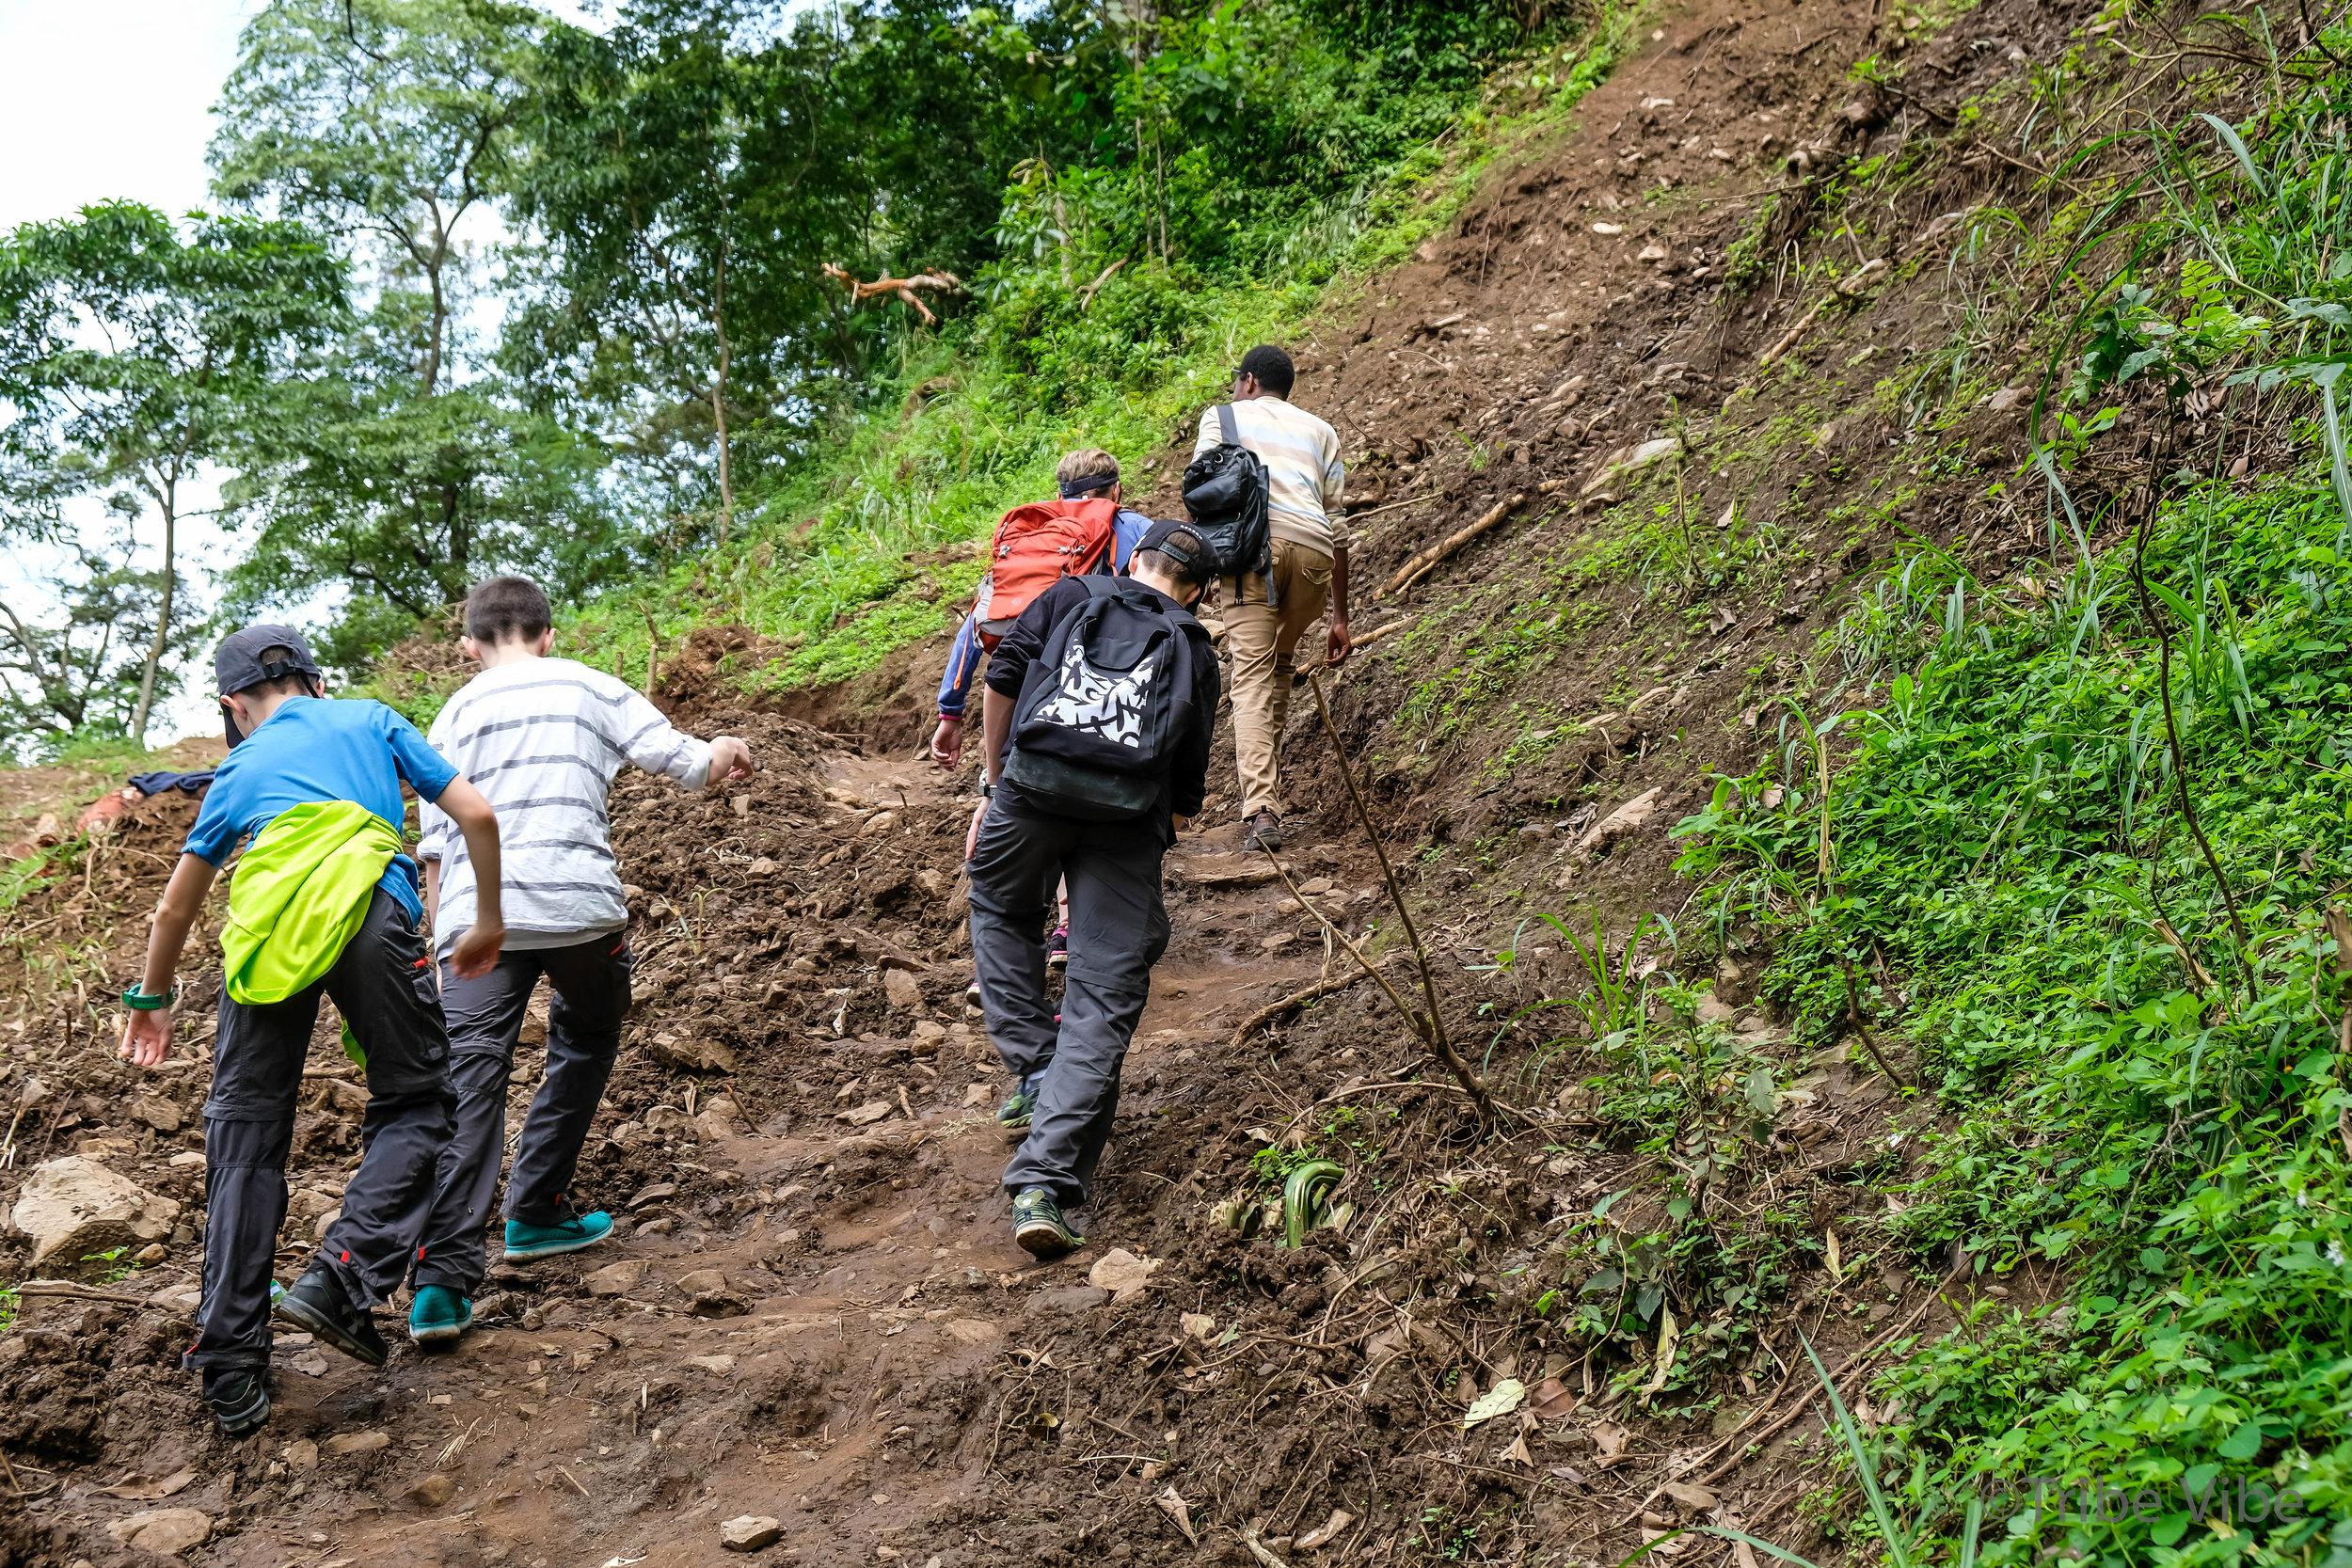 Machame walking trail to the bridge 8, Kilimanjaro.jpg